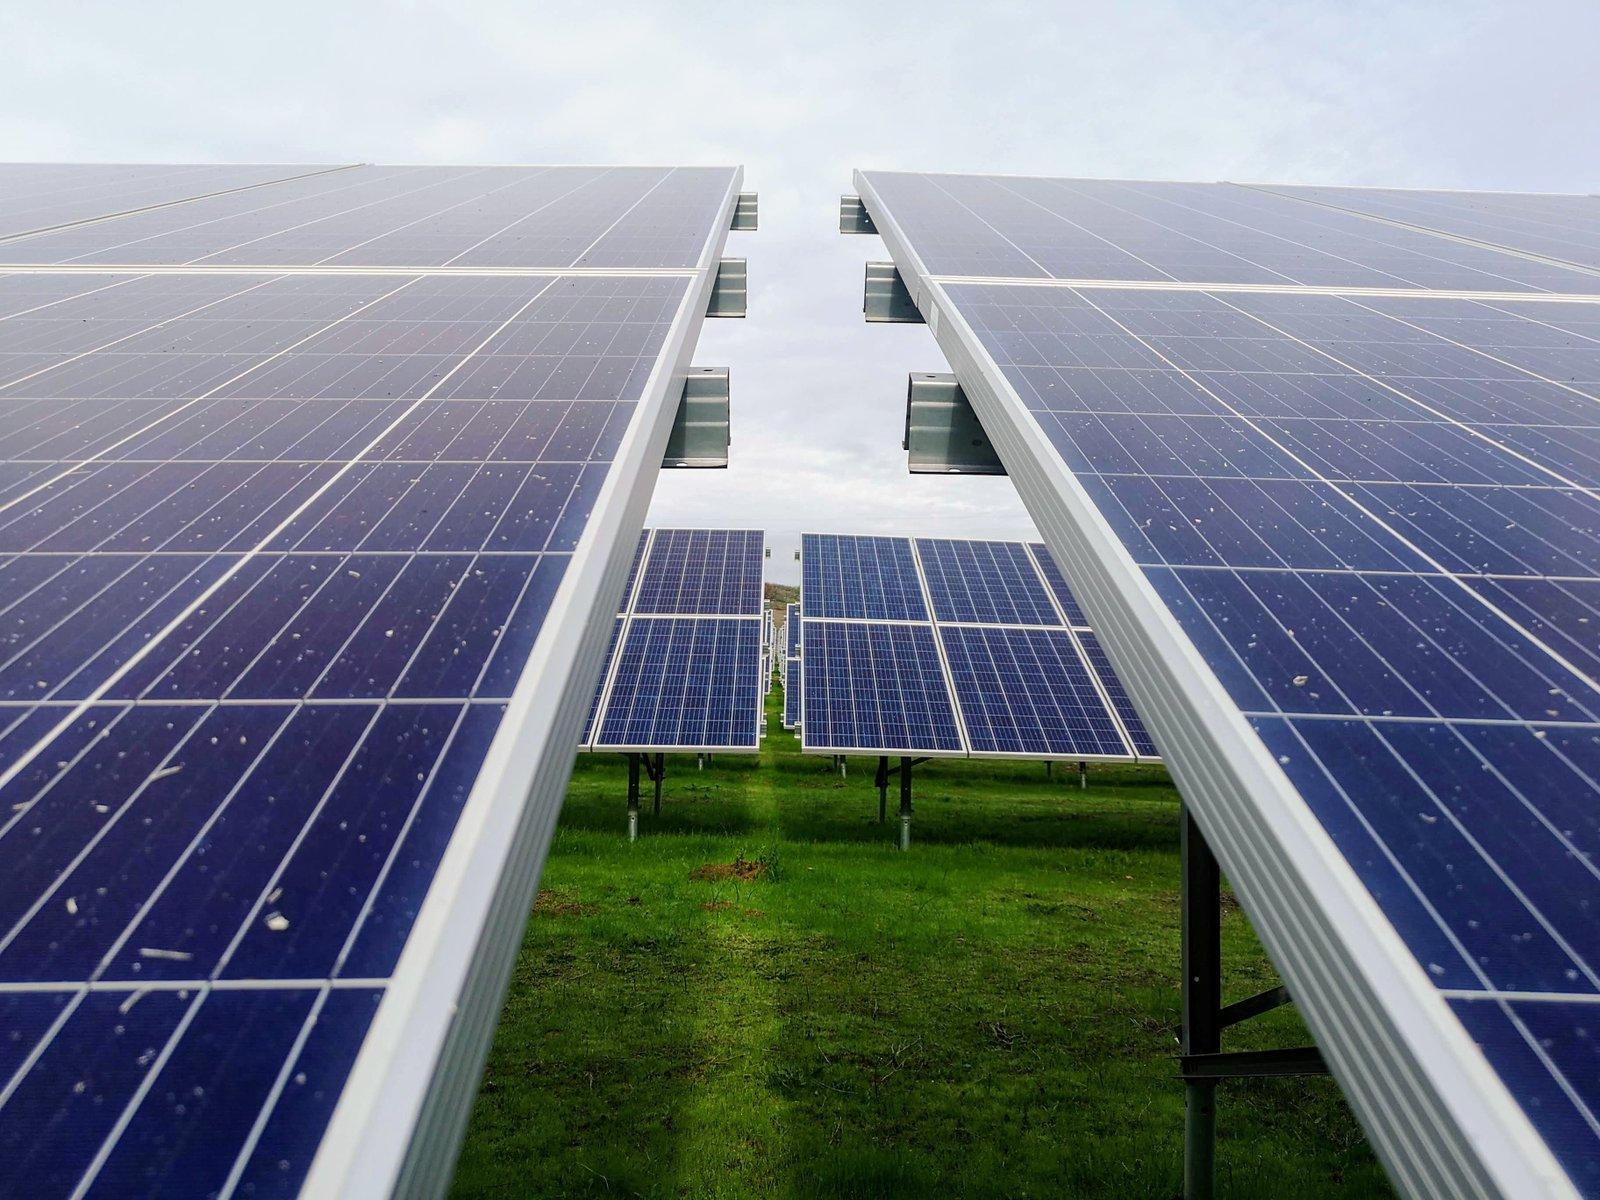 MindSun otimiza o consumo de energia e democratiza o acesso à energia solar